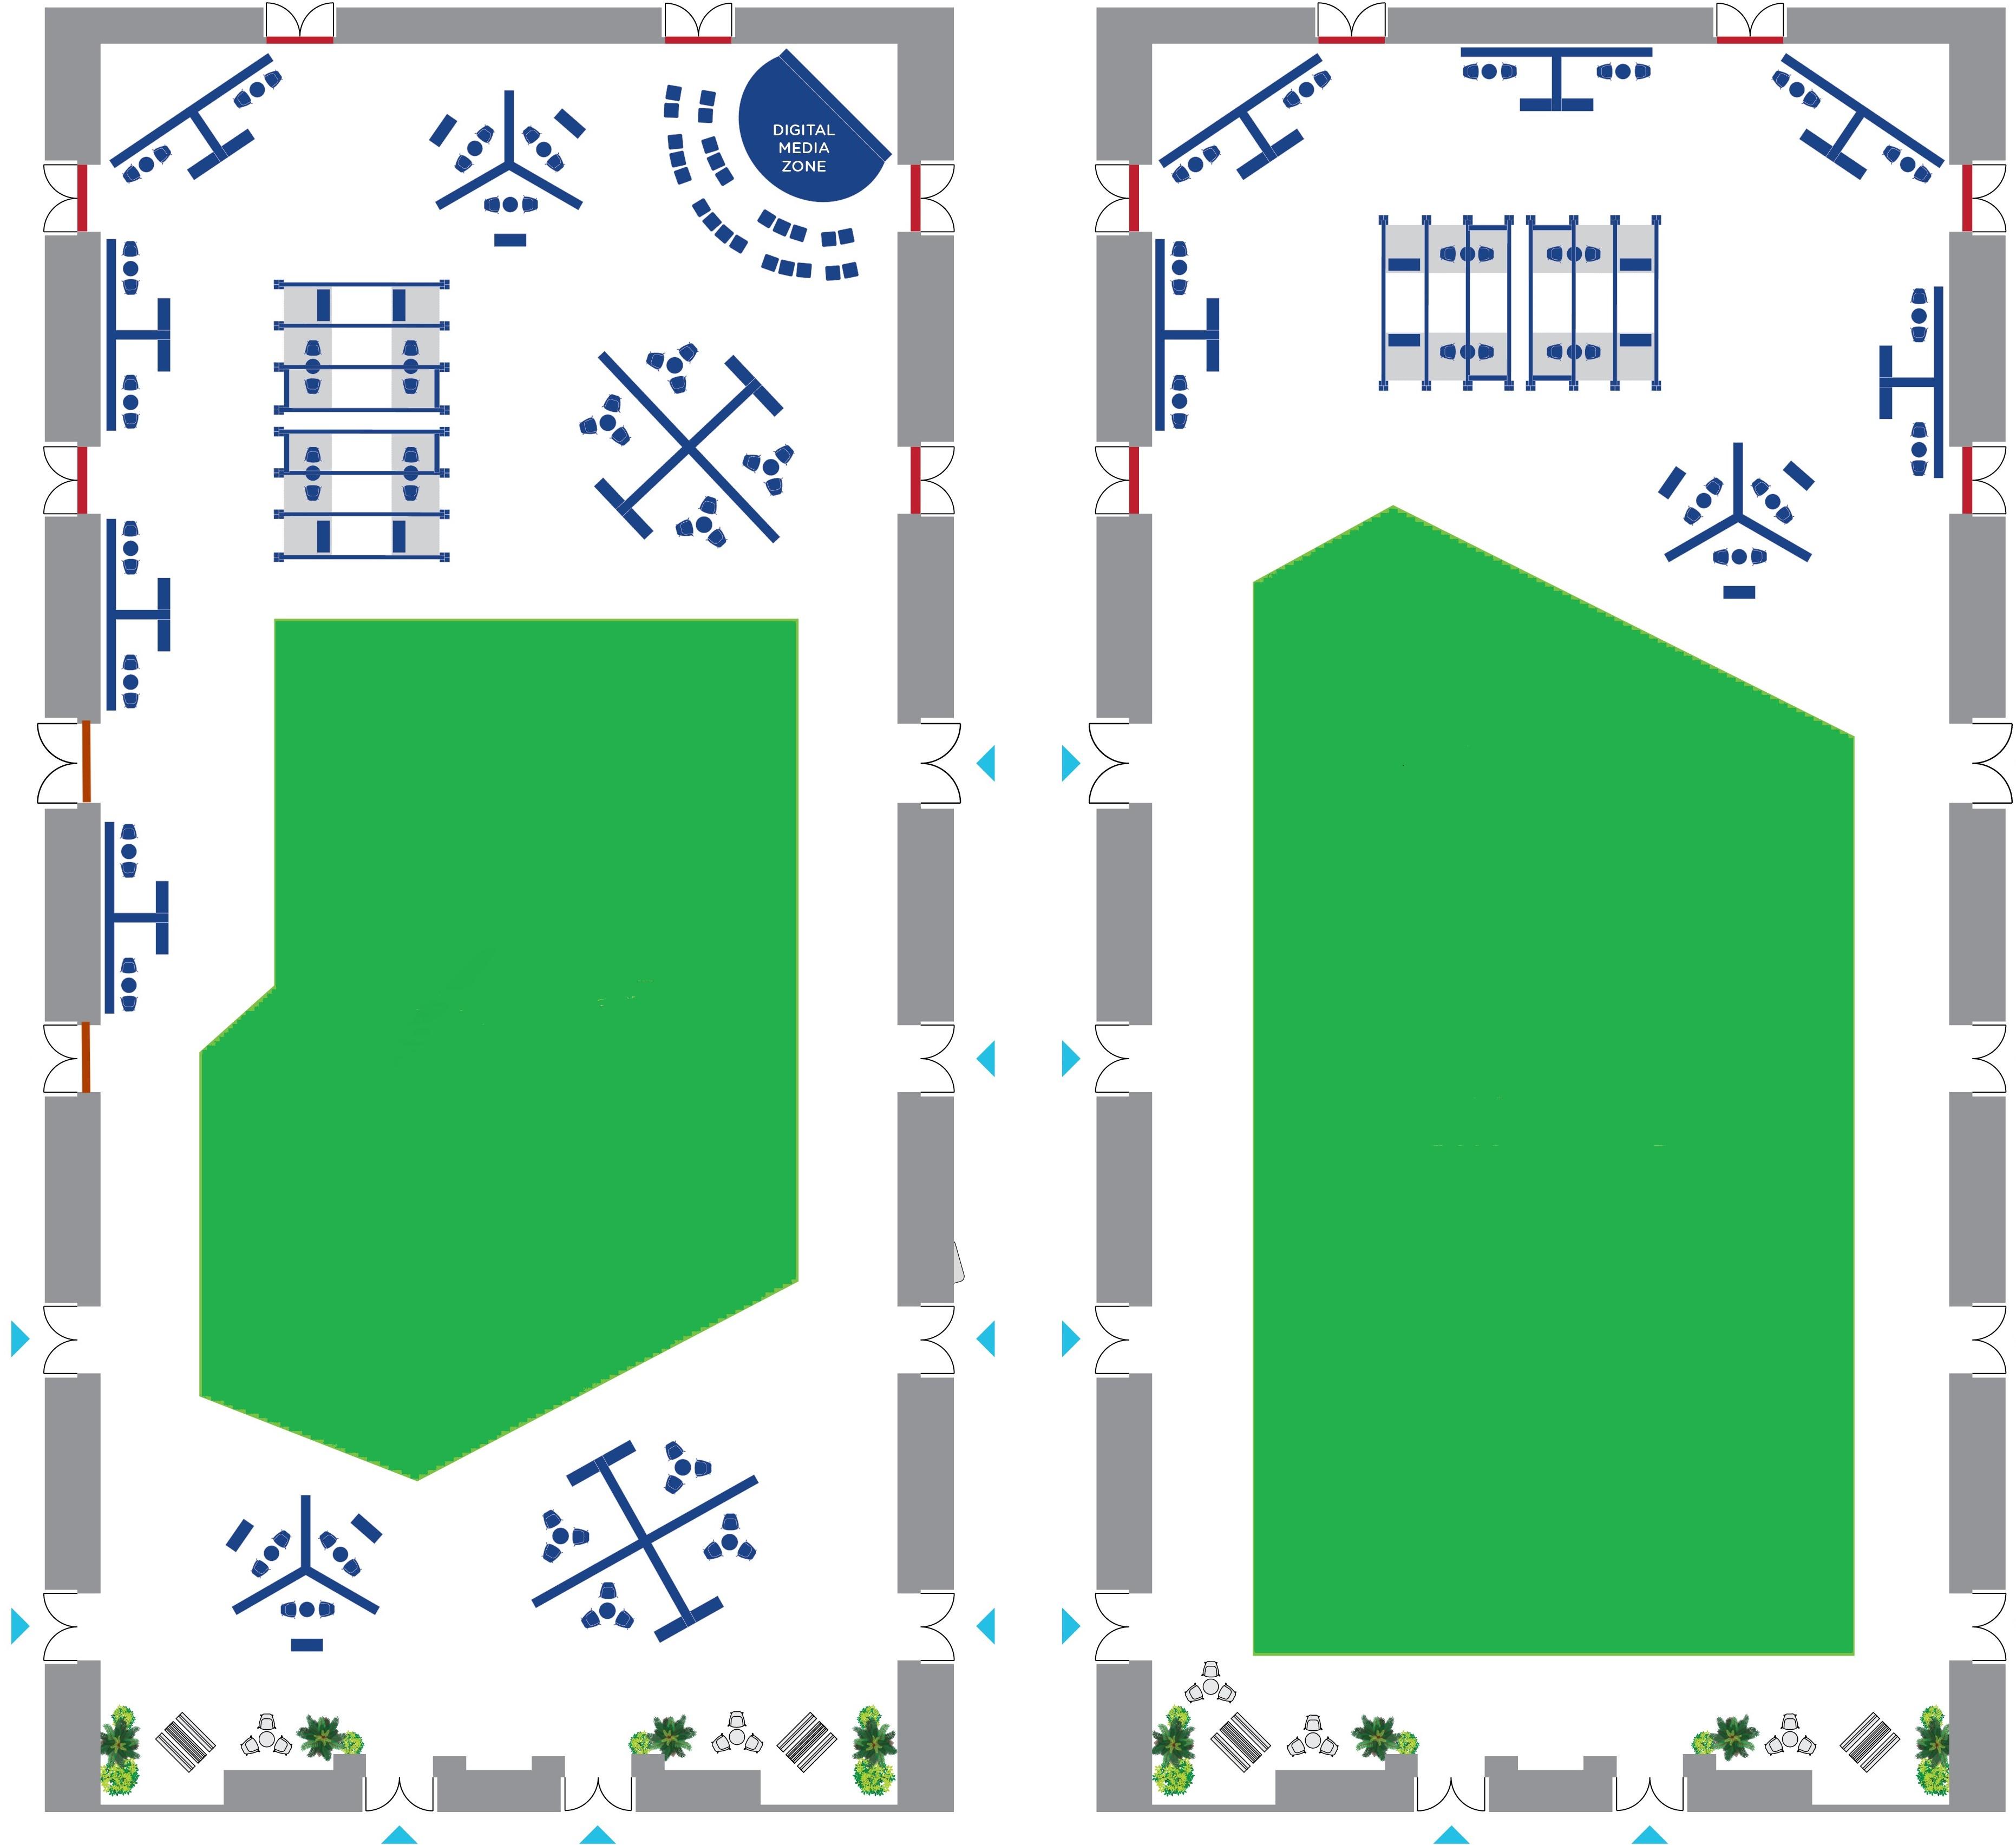 I4C_Exhibition Floorplan (For Website new)